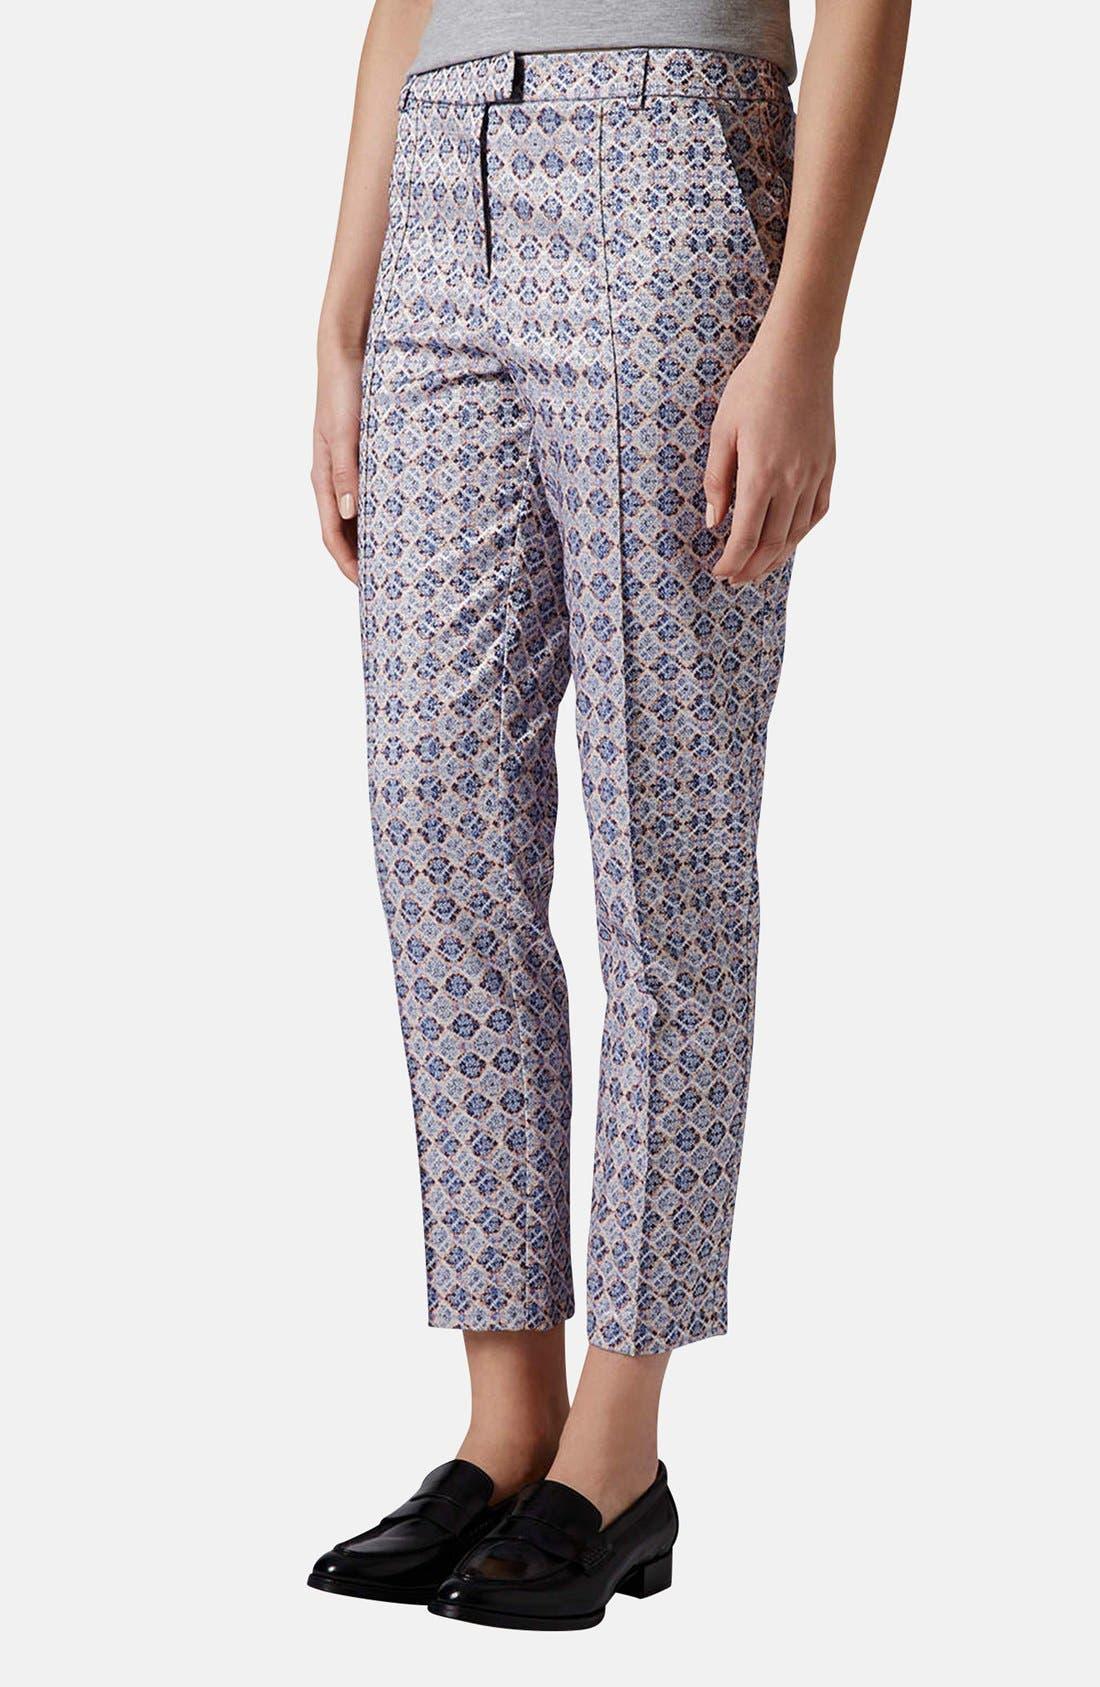 Alternate Image 1 Selected - Topshop 'Folk Tile' Crop Jacquard Trousers